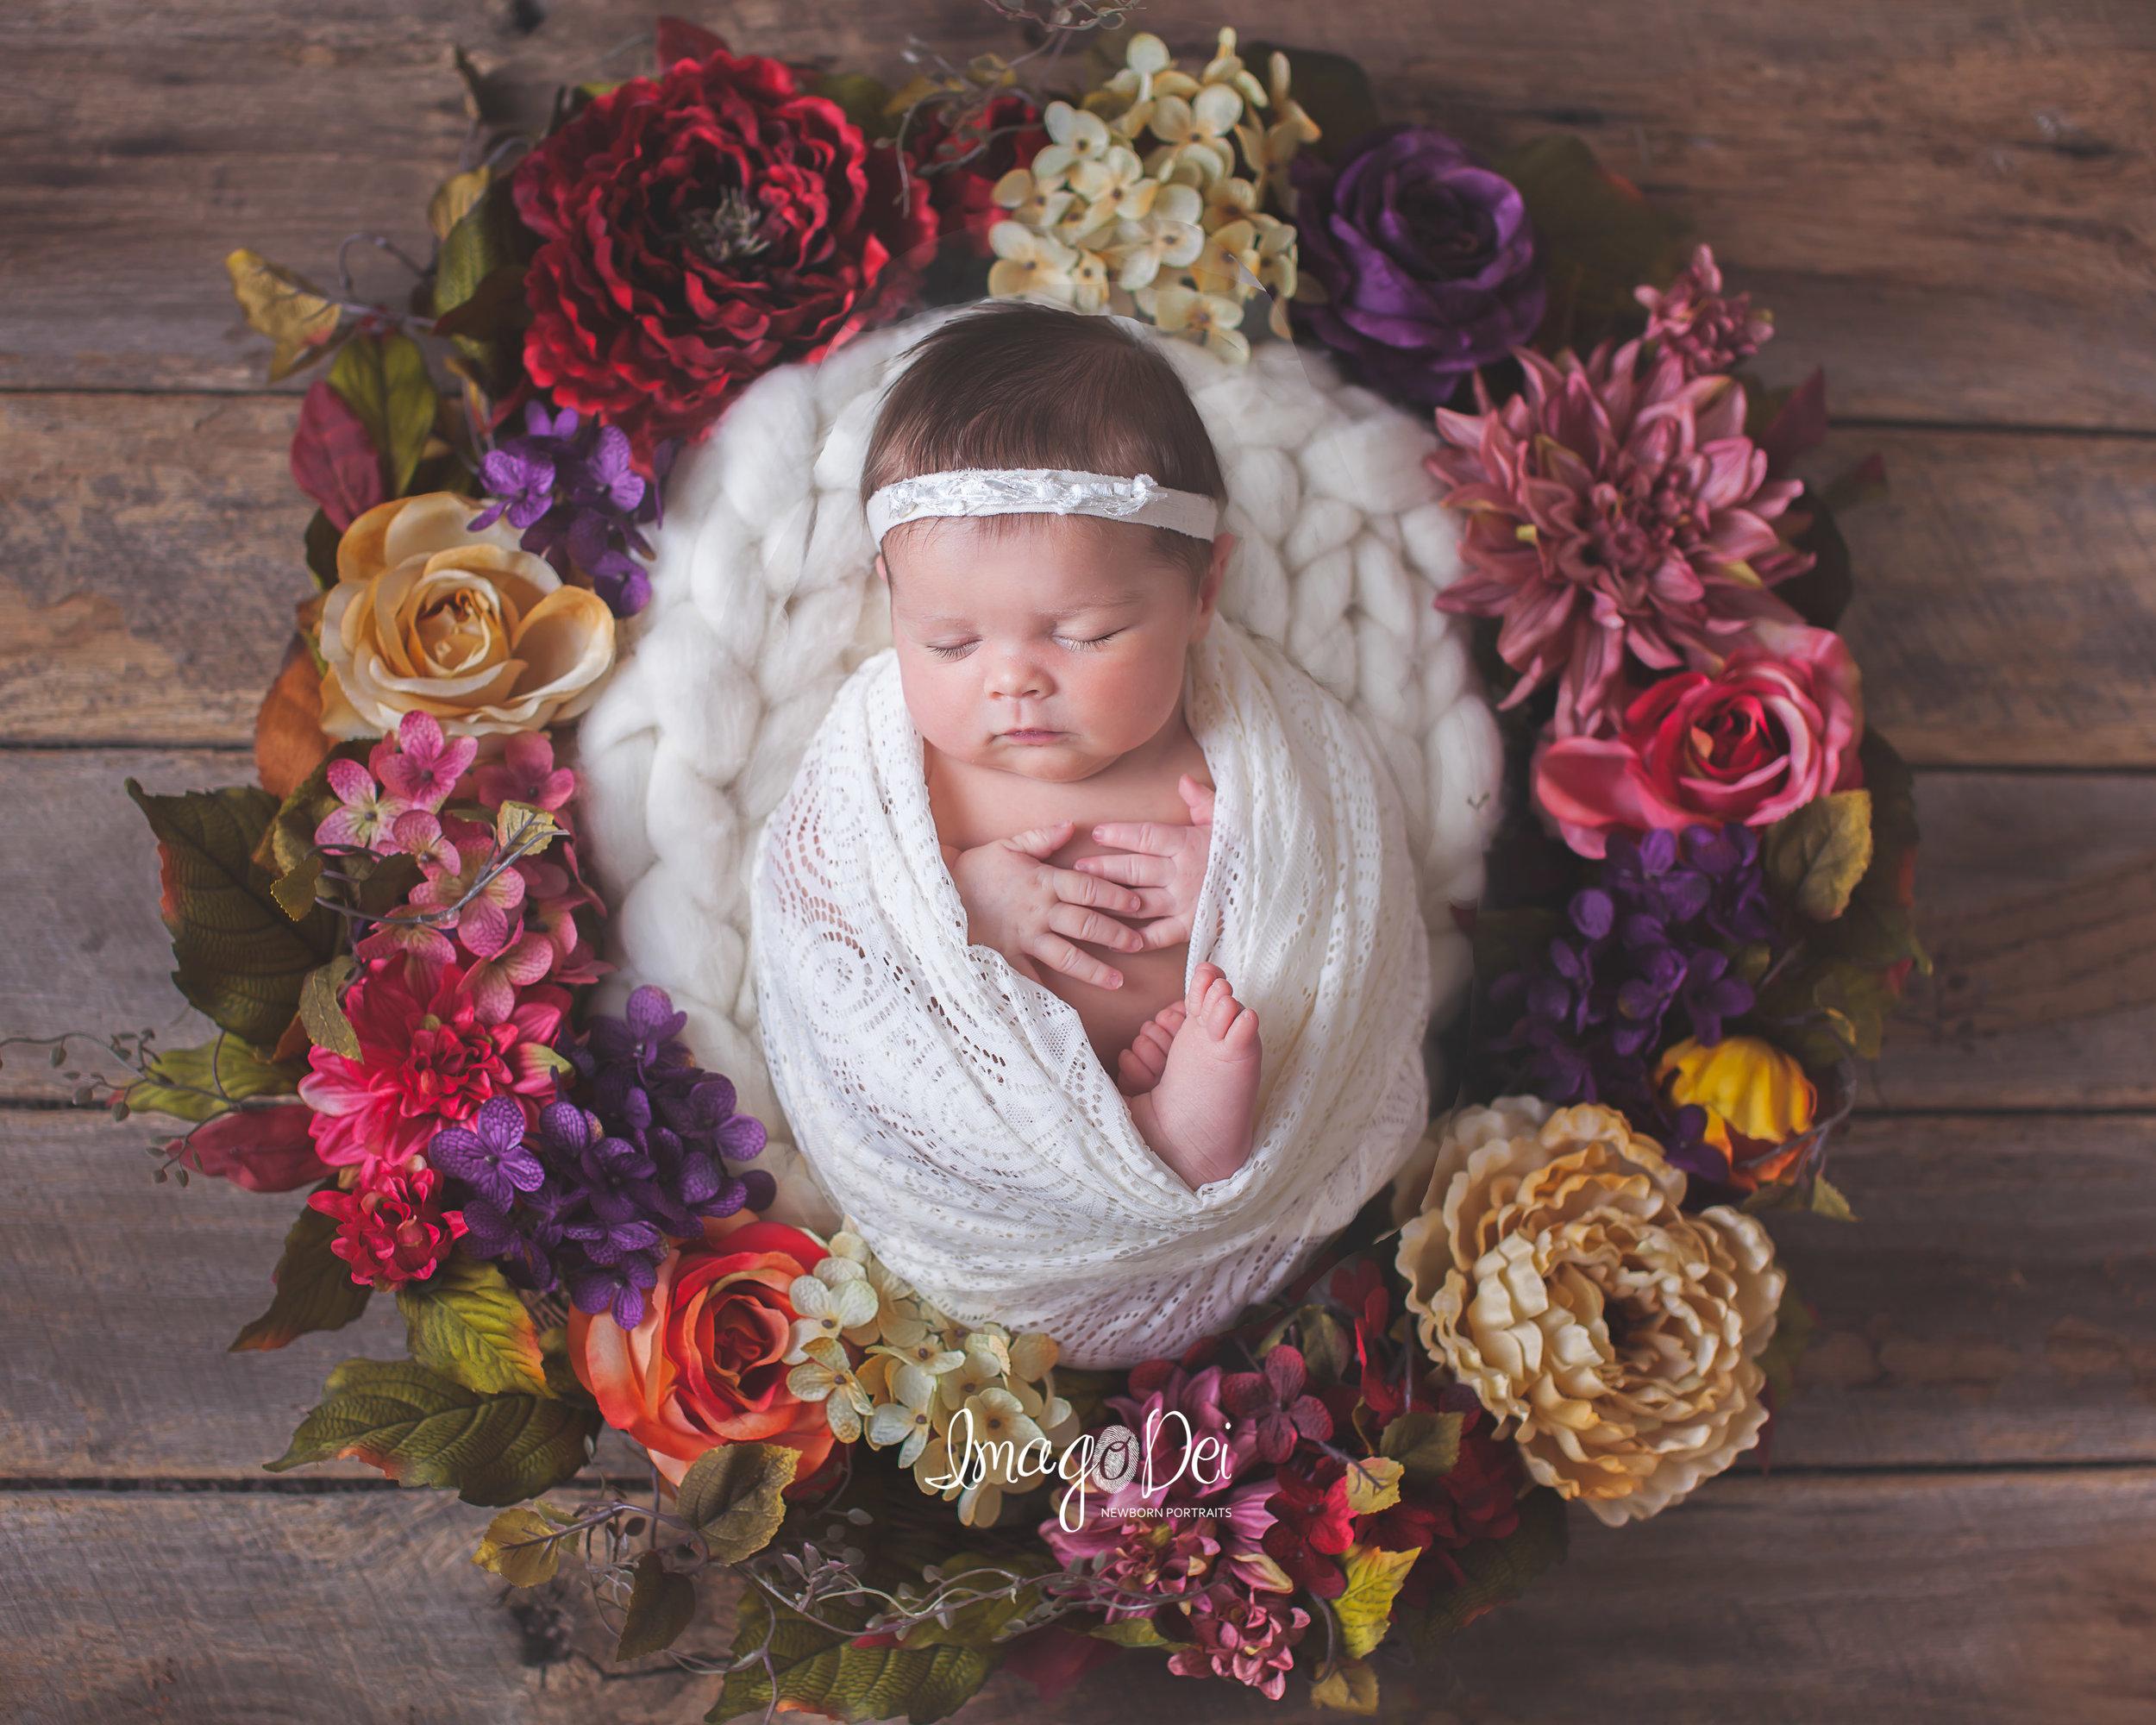 imago-dei-newborn-photography-mo